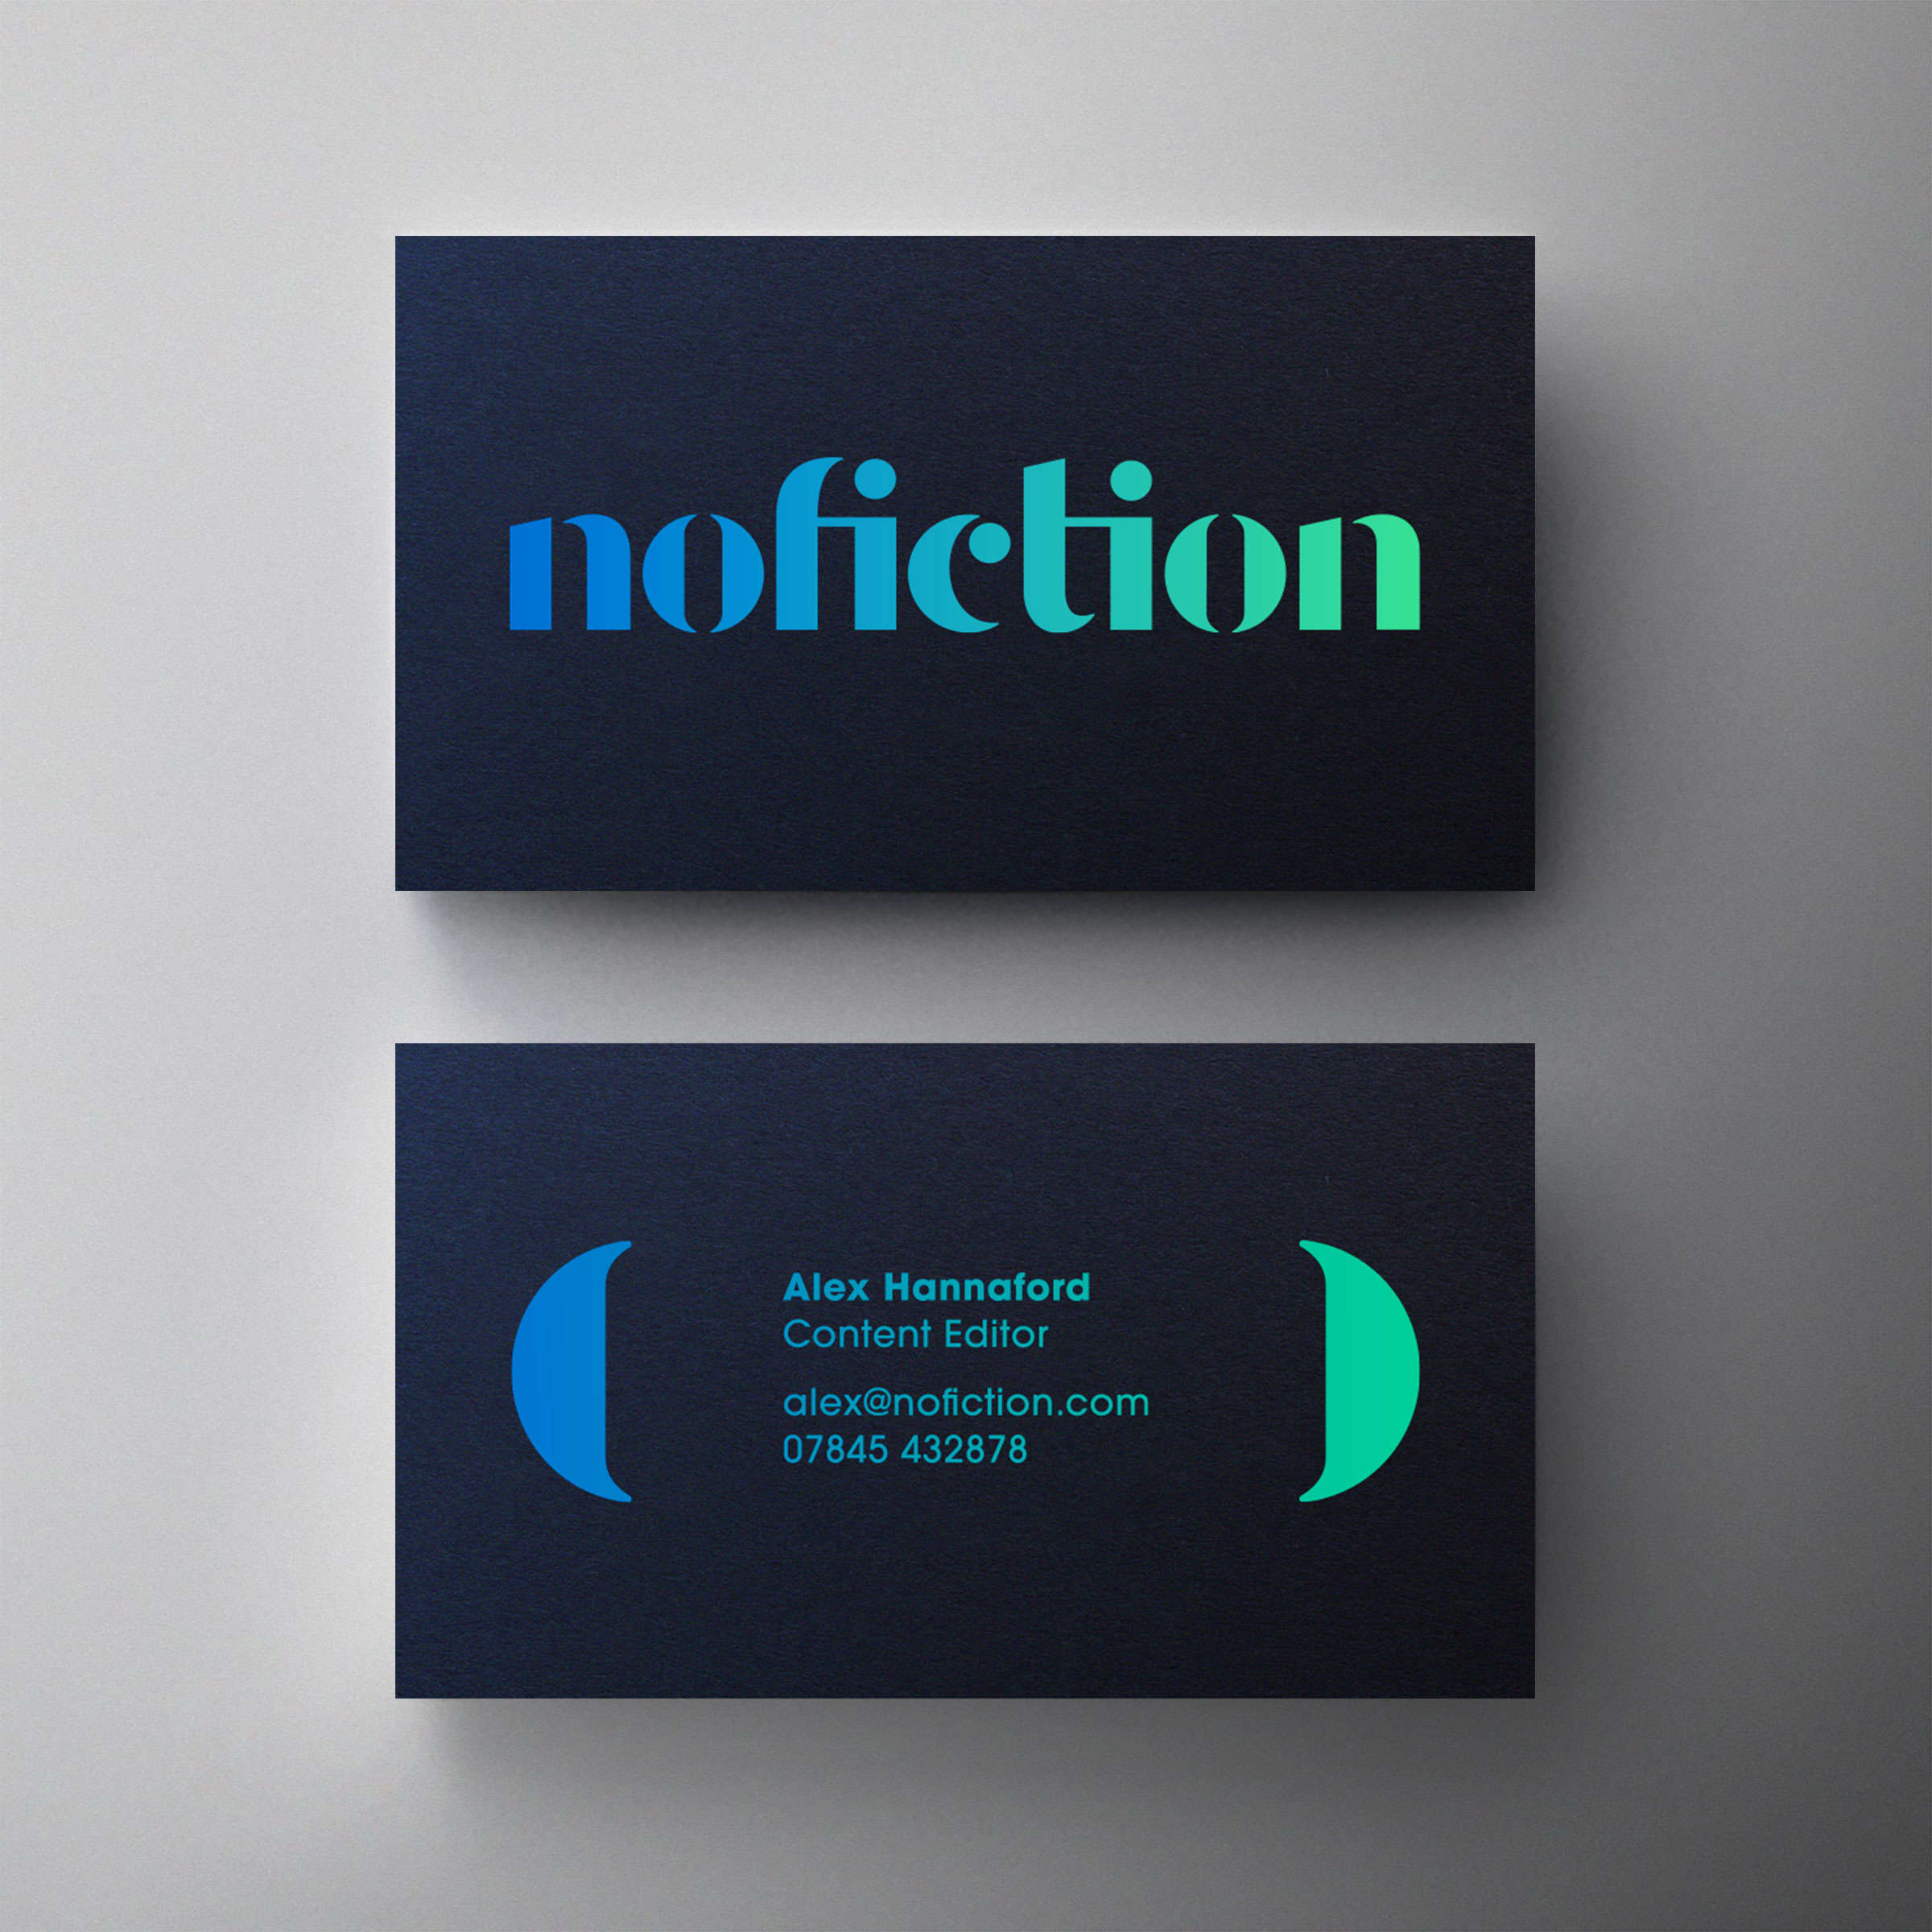 NoFiction business card design